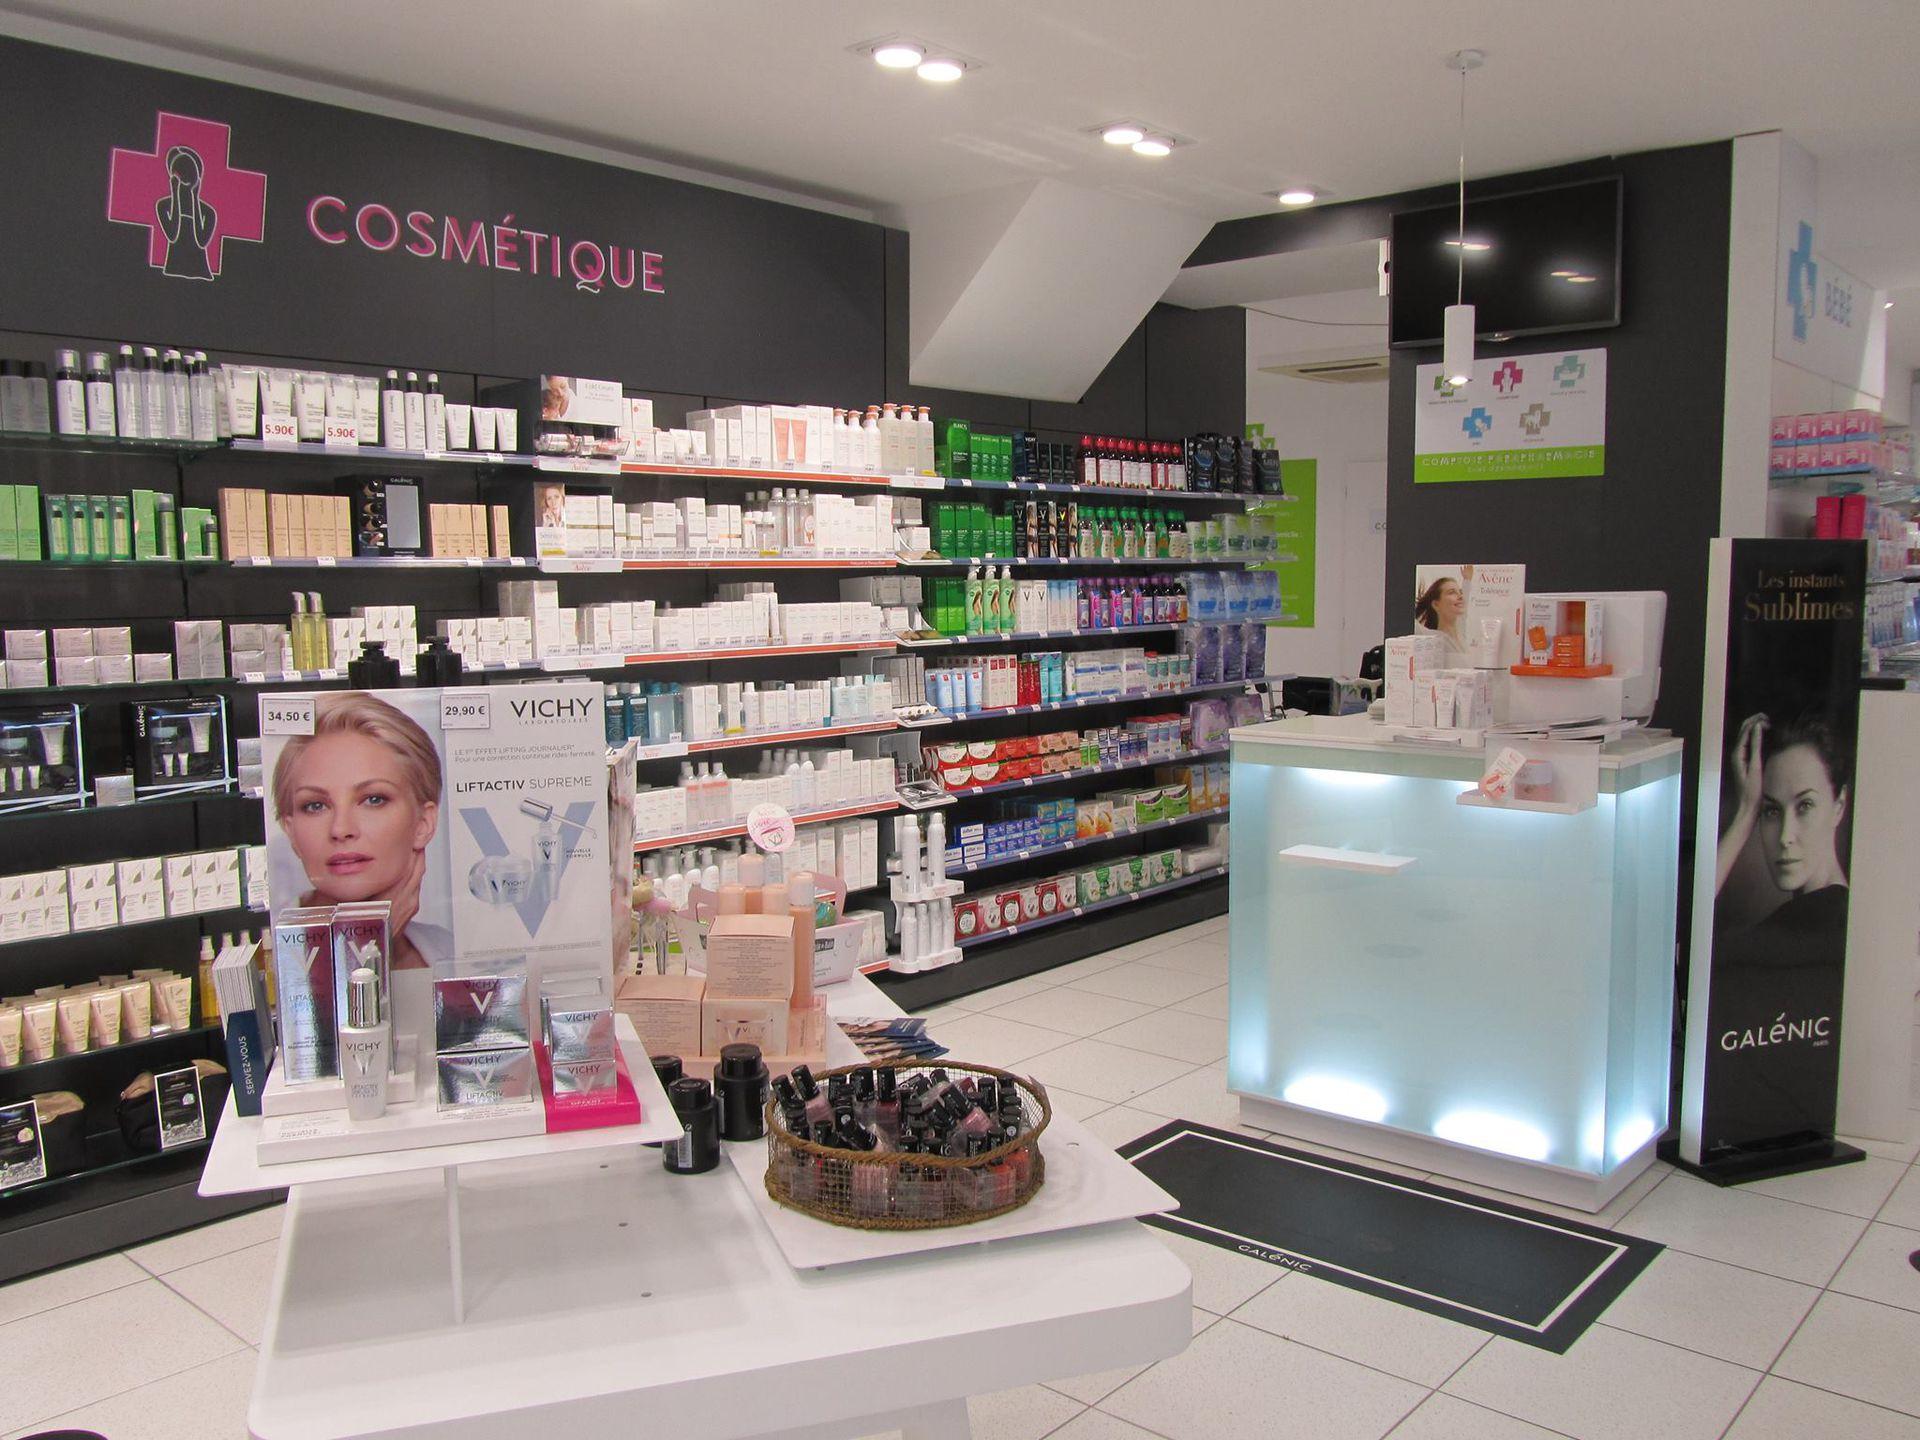 Pharmacie Leeuws-Guilloton Catherine pharmacie